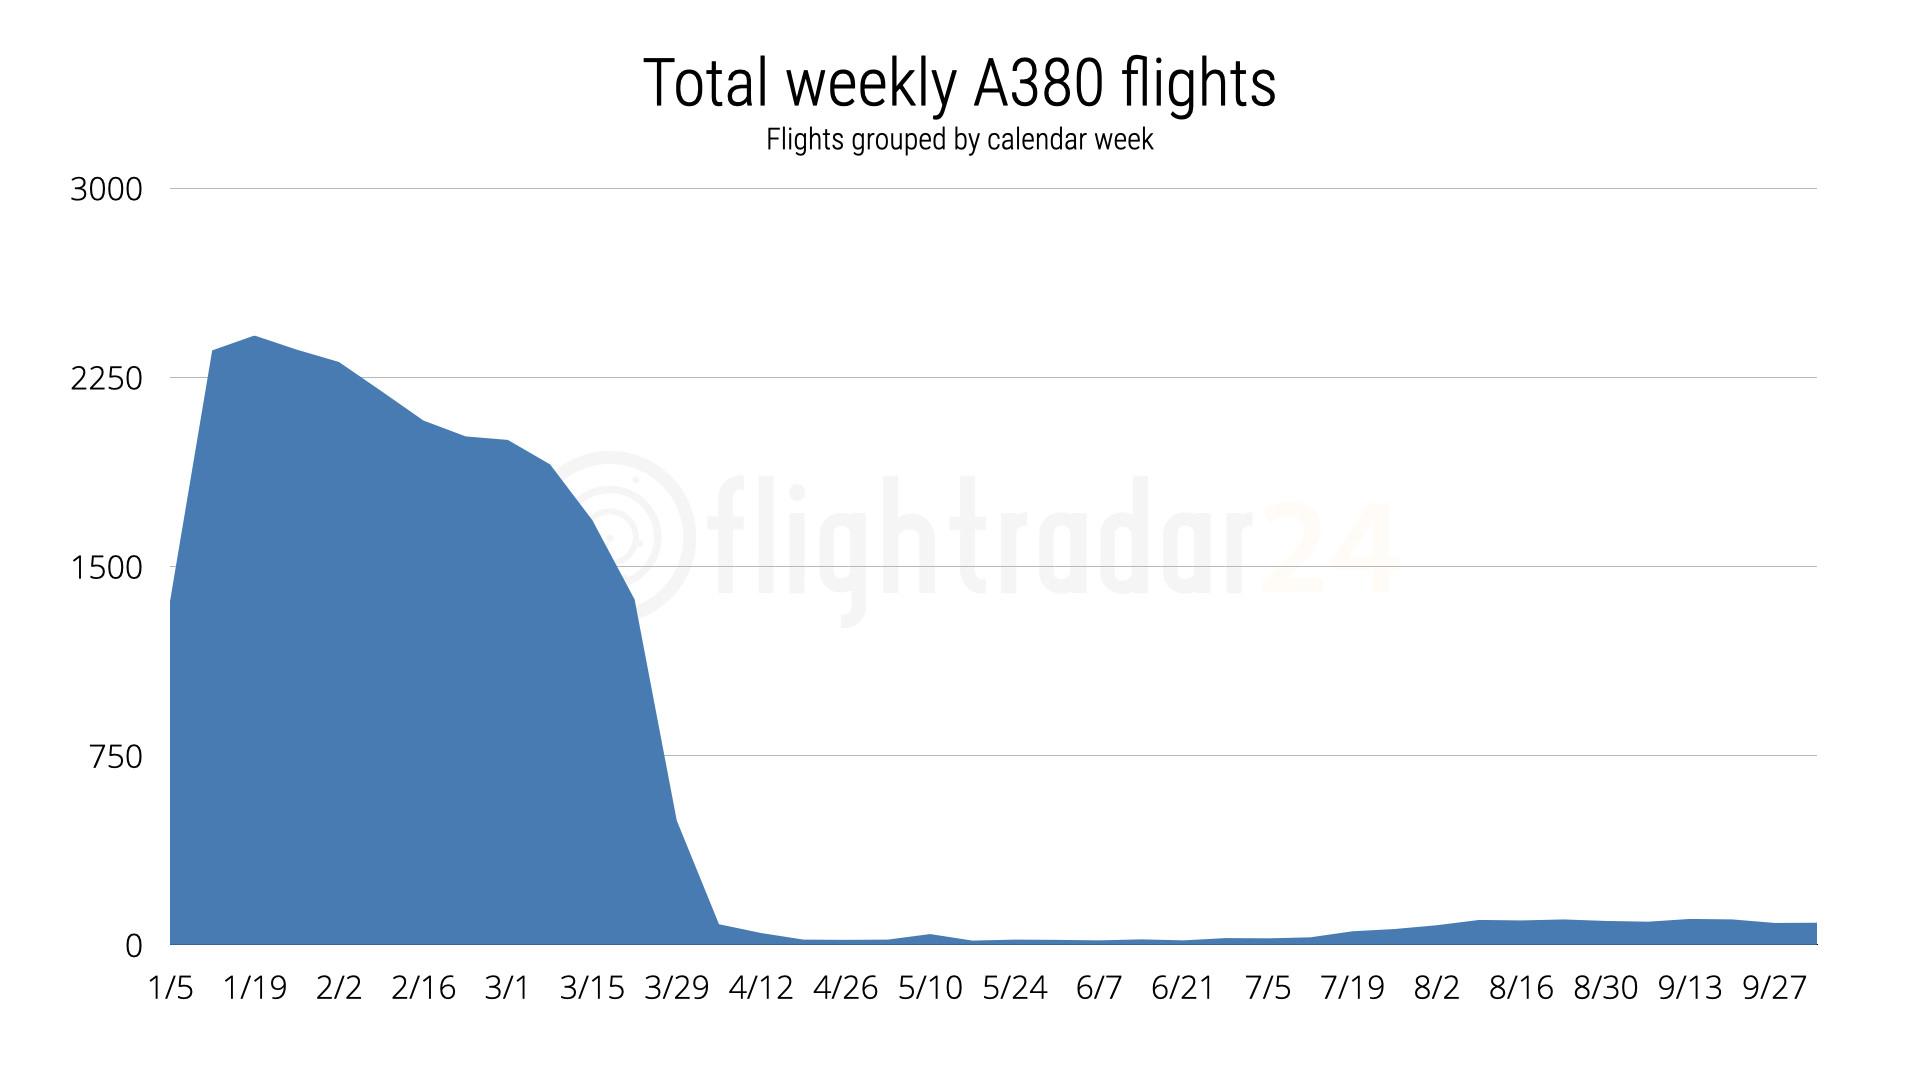 Total Weekly A380 flights